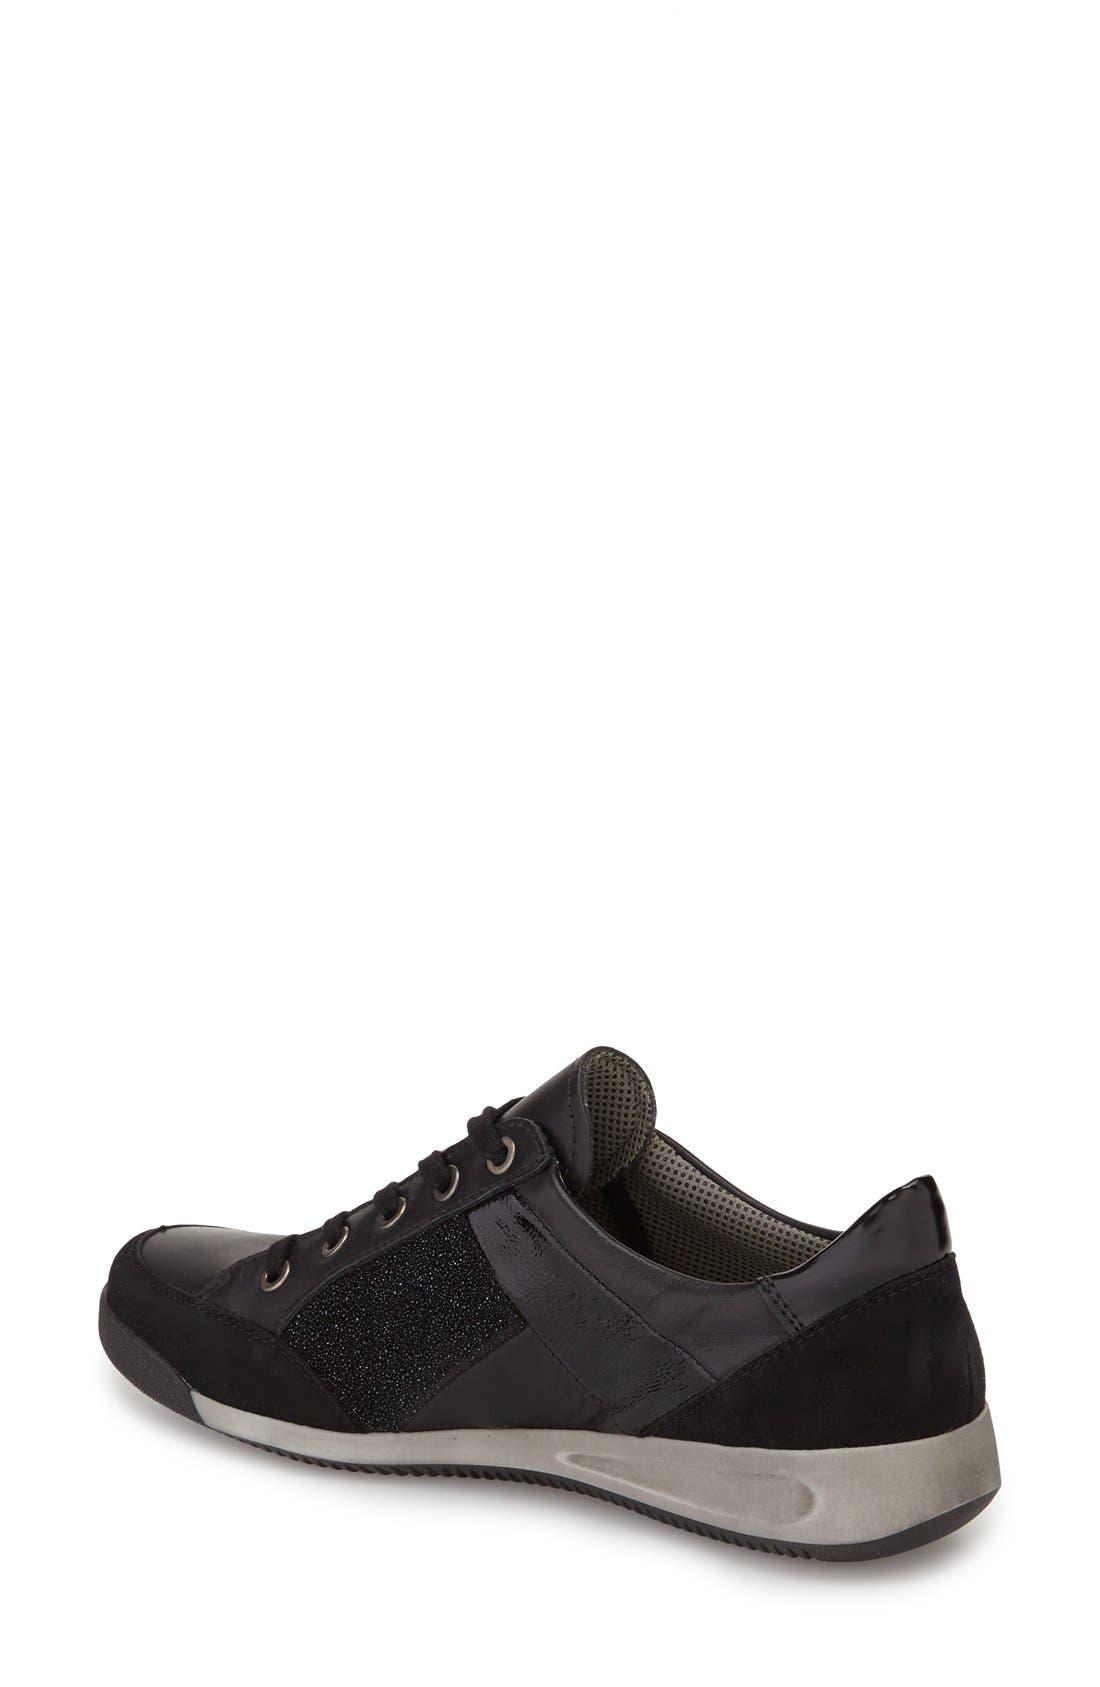 Rina Sneaker,                             Alternate thumbnail 2, color,                             BLACK SUEDE